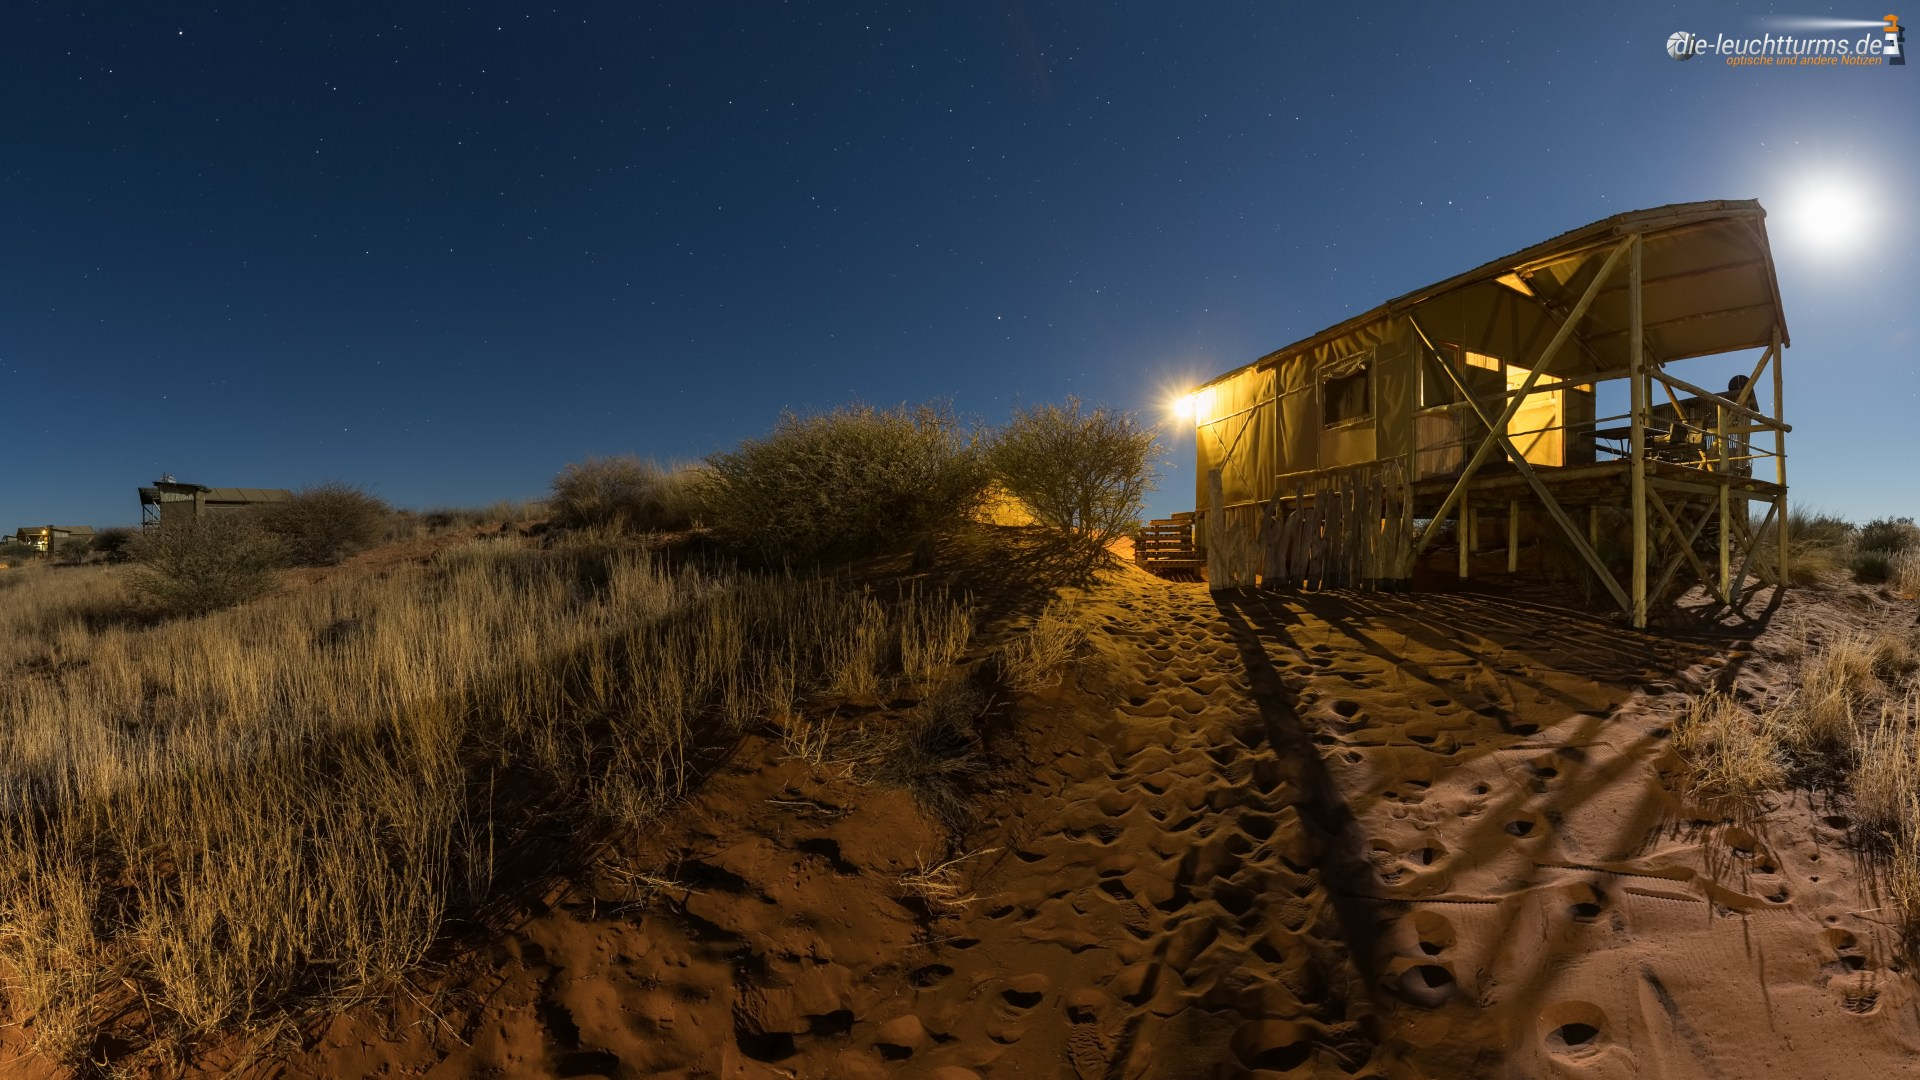 The night comes in the Kalahari